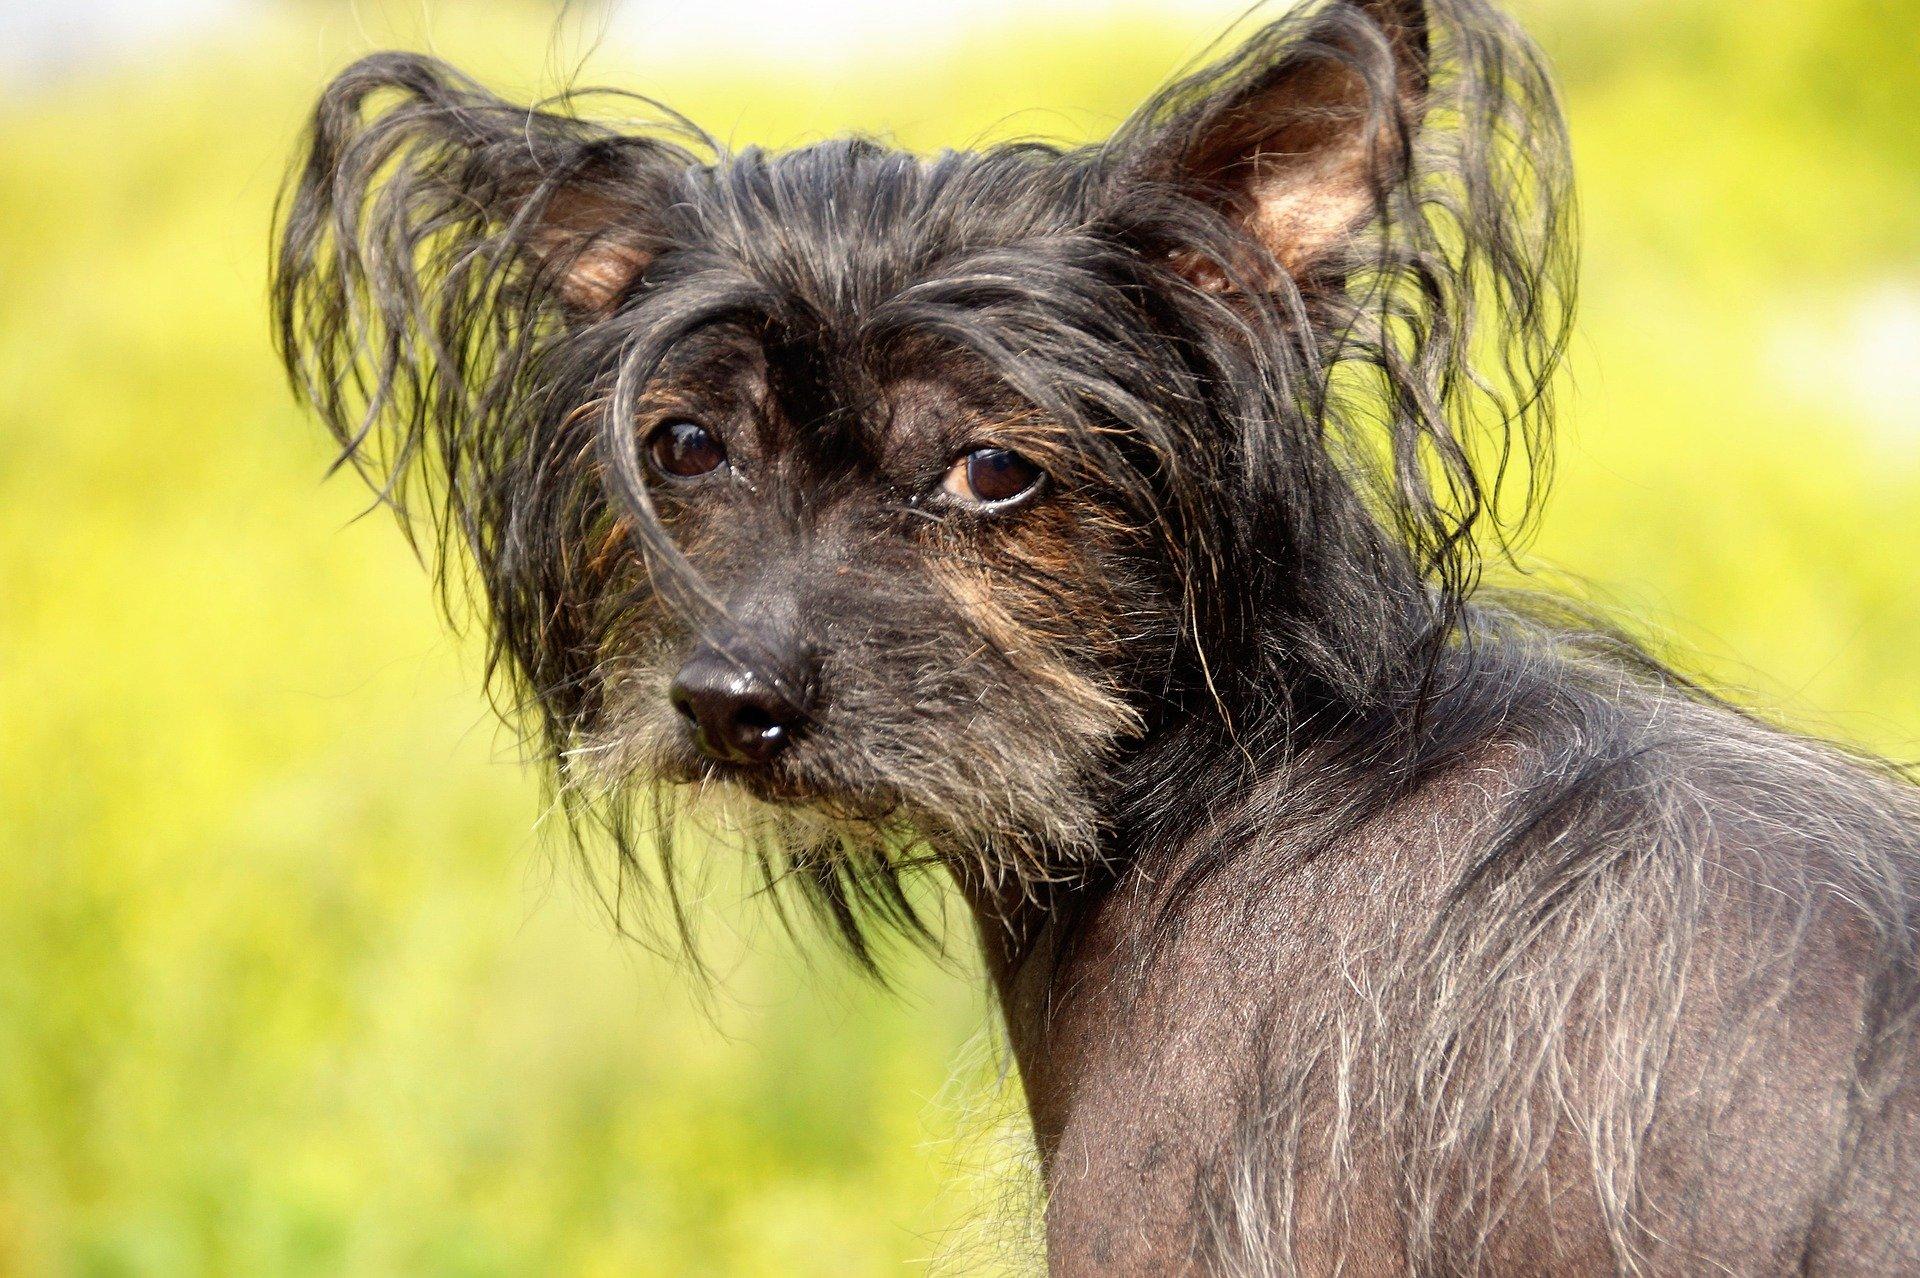 Xoloitzcuintle, carattere e prezzo - Razze cani